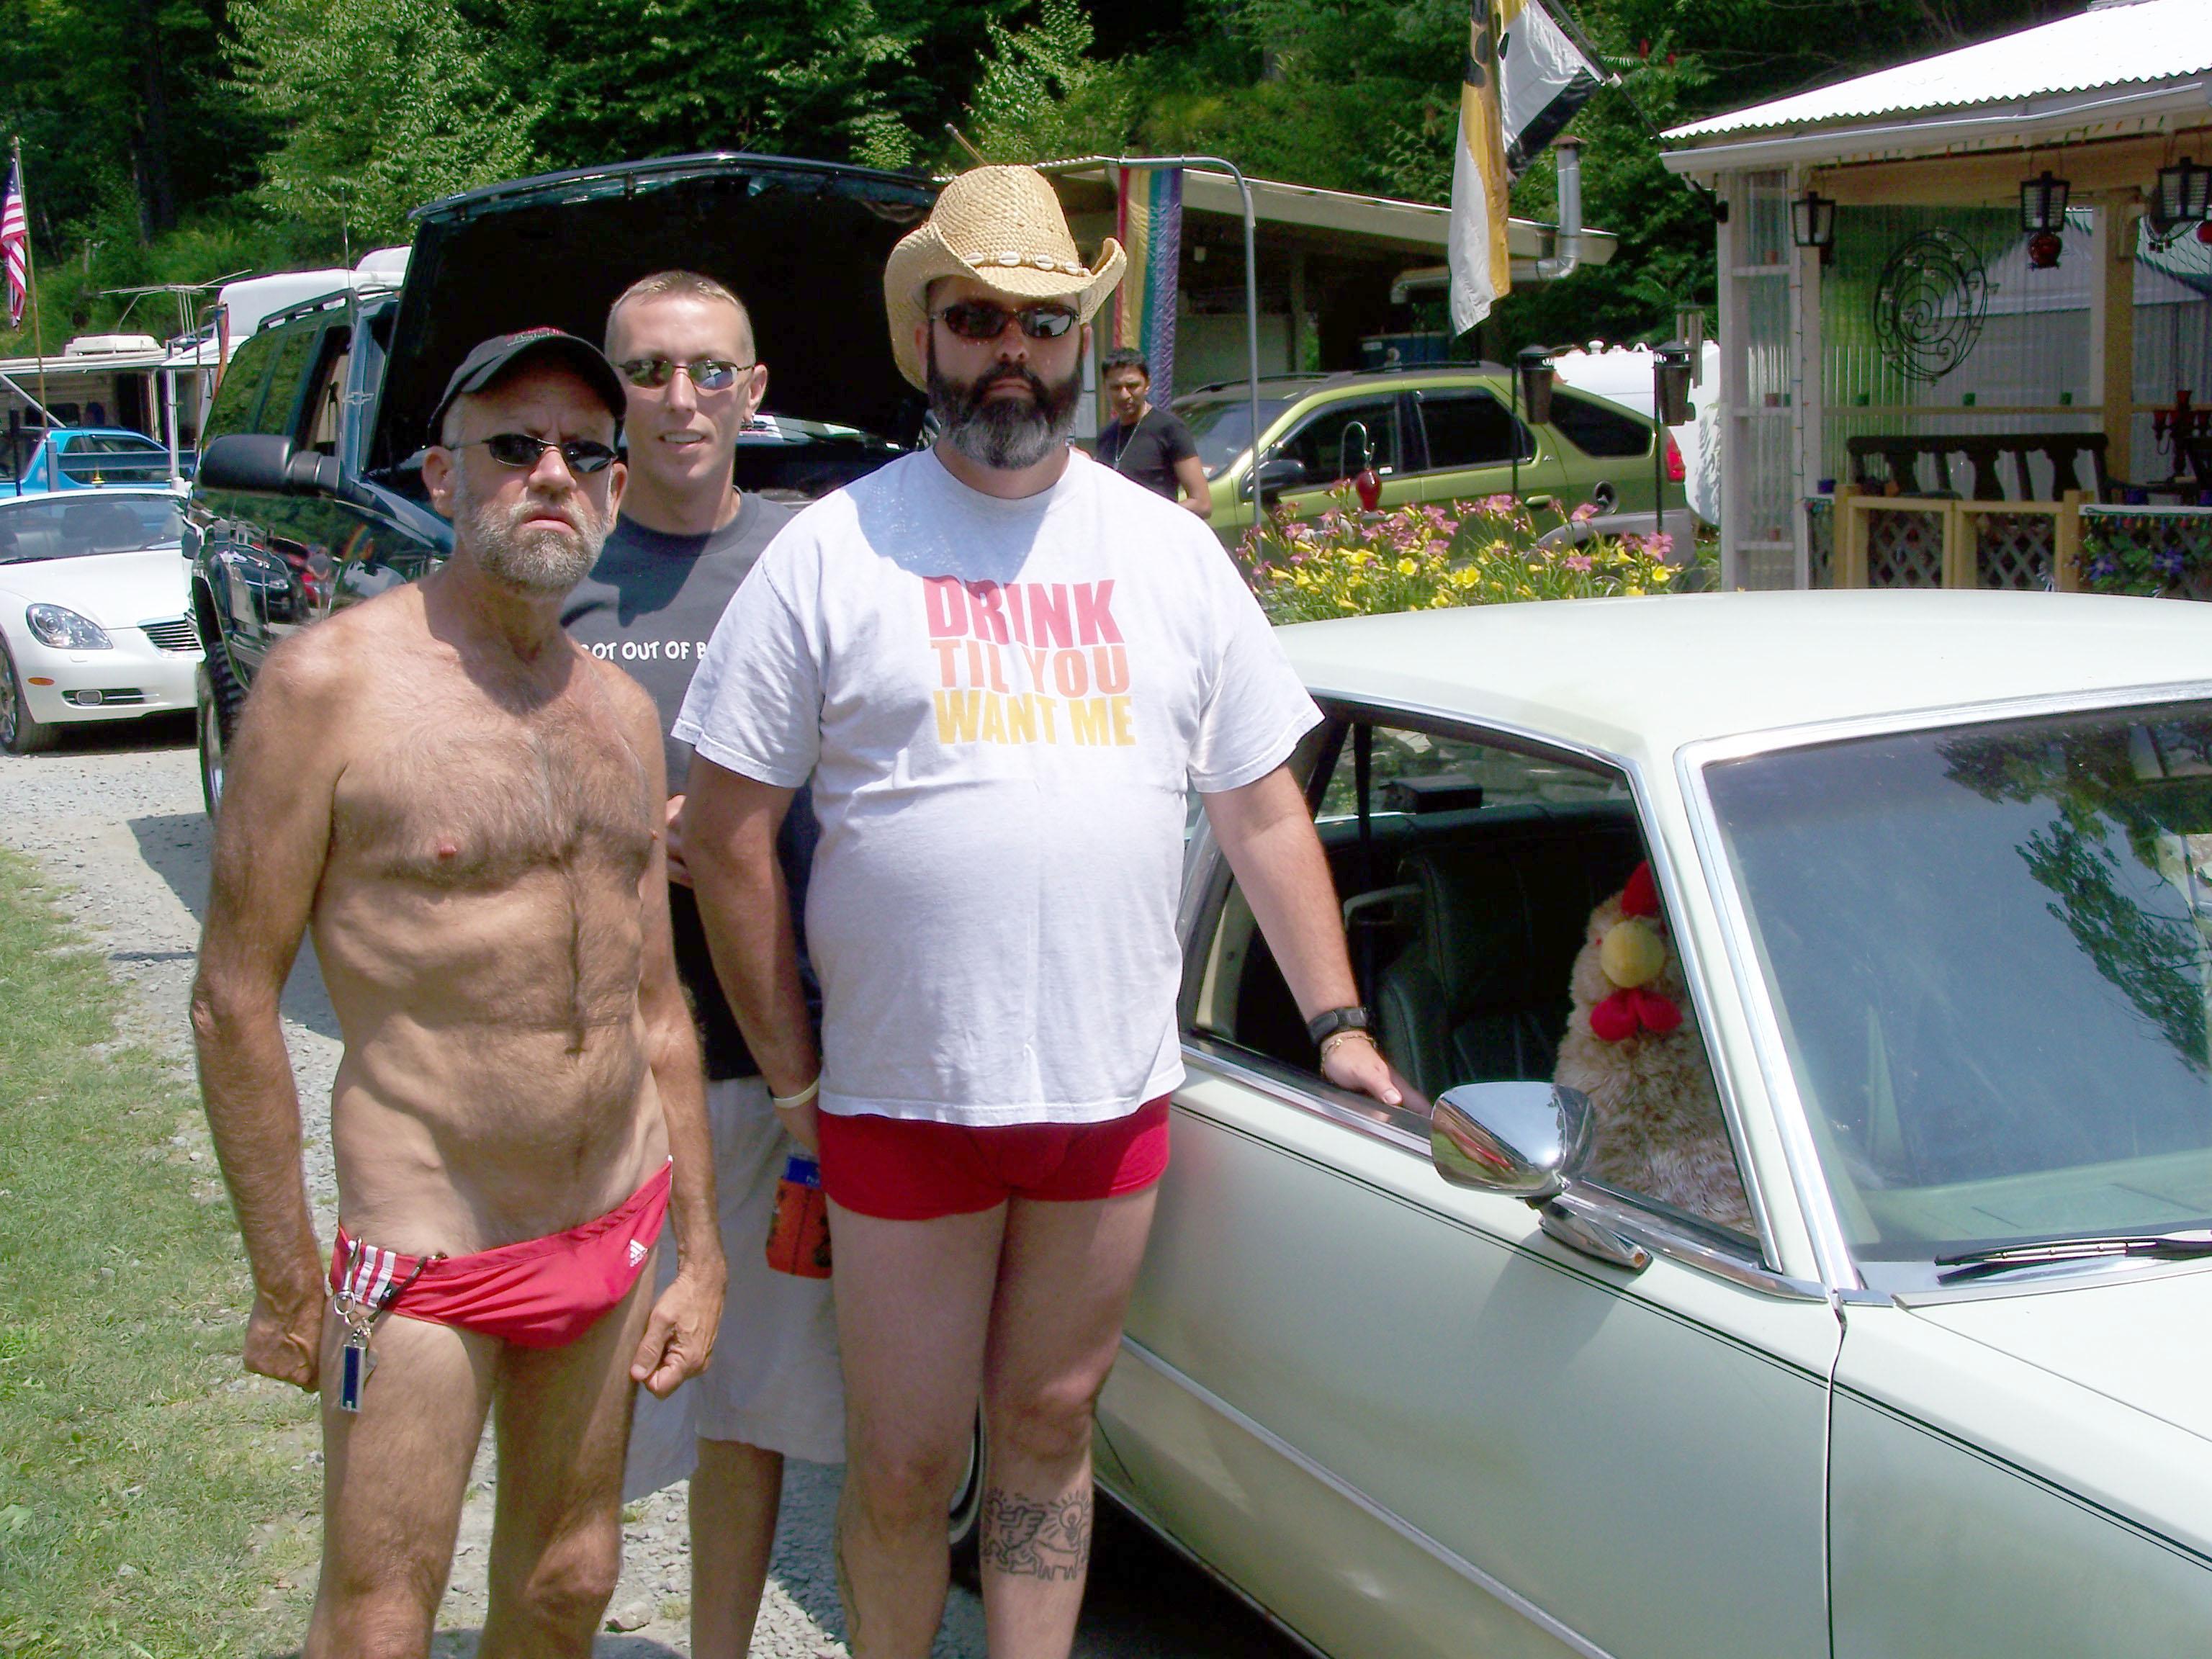 Pennsylvania Gay Campgrounds - Gay Camping USA